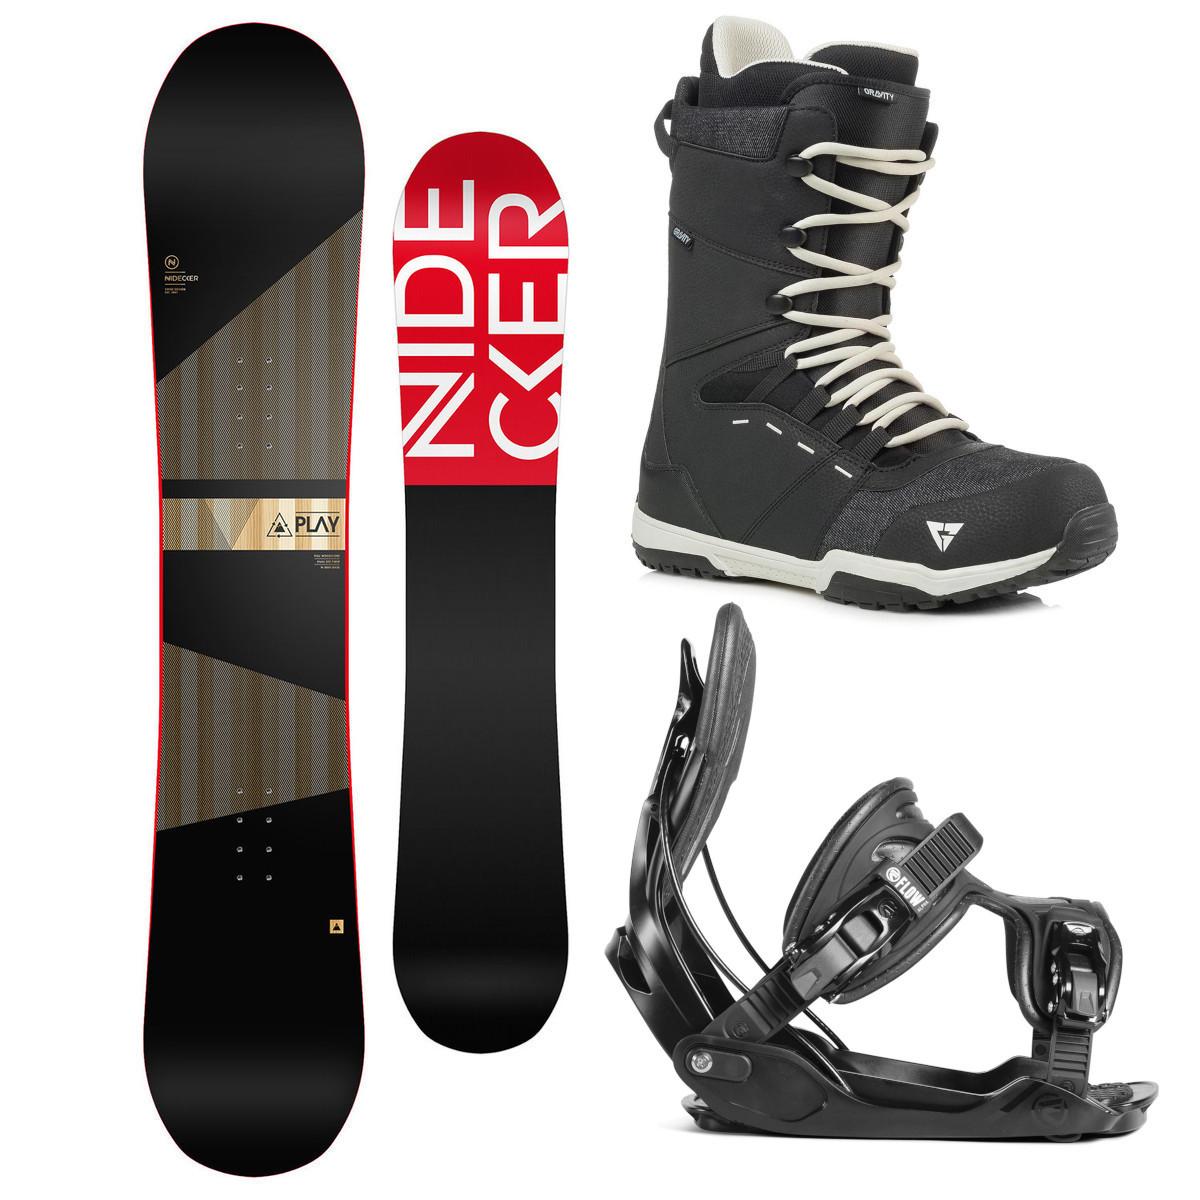 Snowboardový komplet Nidecker Play 17/18 XL (EU 44-49,5) 162XL